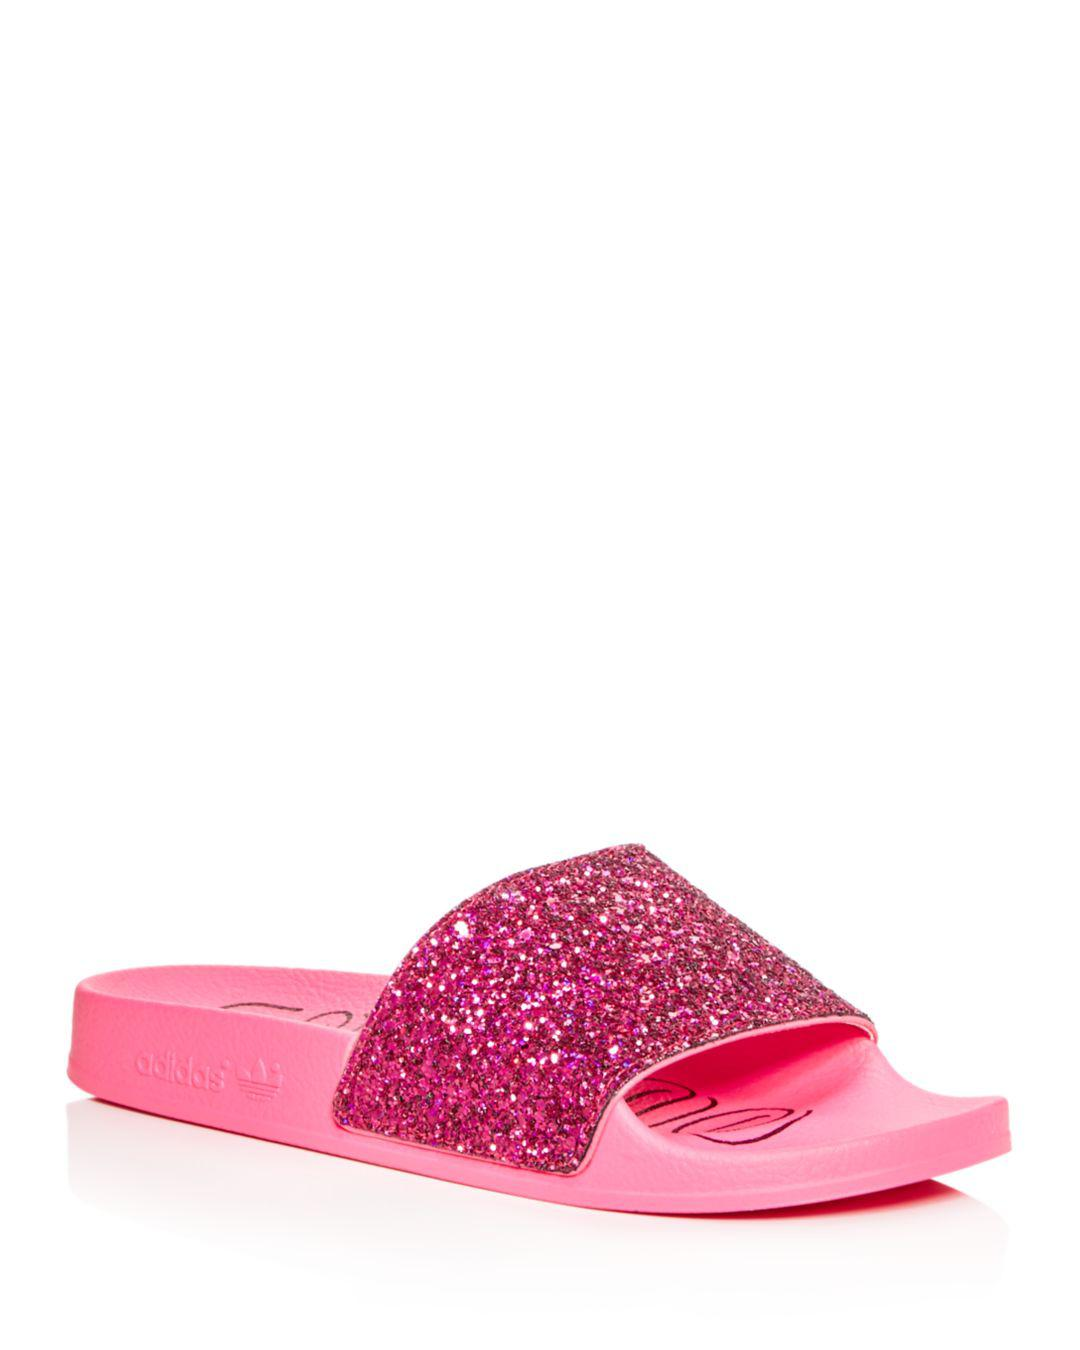 061a3b0278f adidas Women s Adilette Glitter Slide Sandals in Pink - Lyst